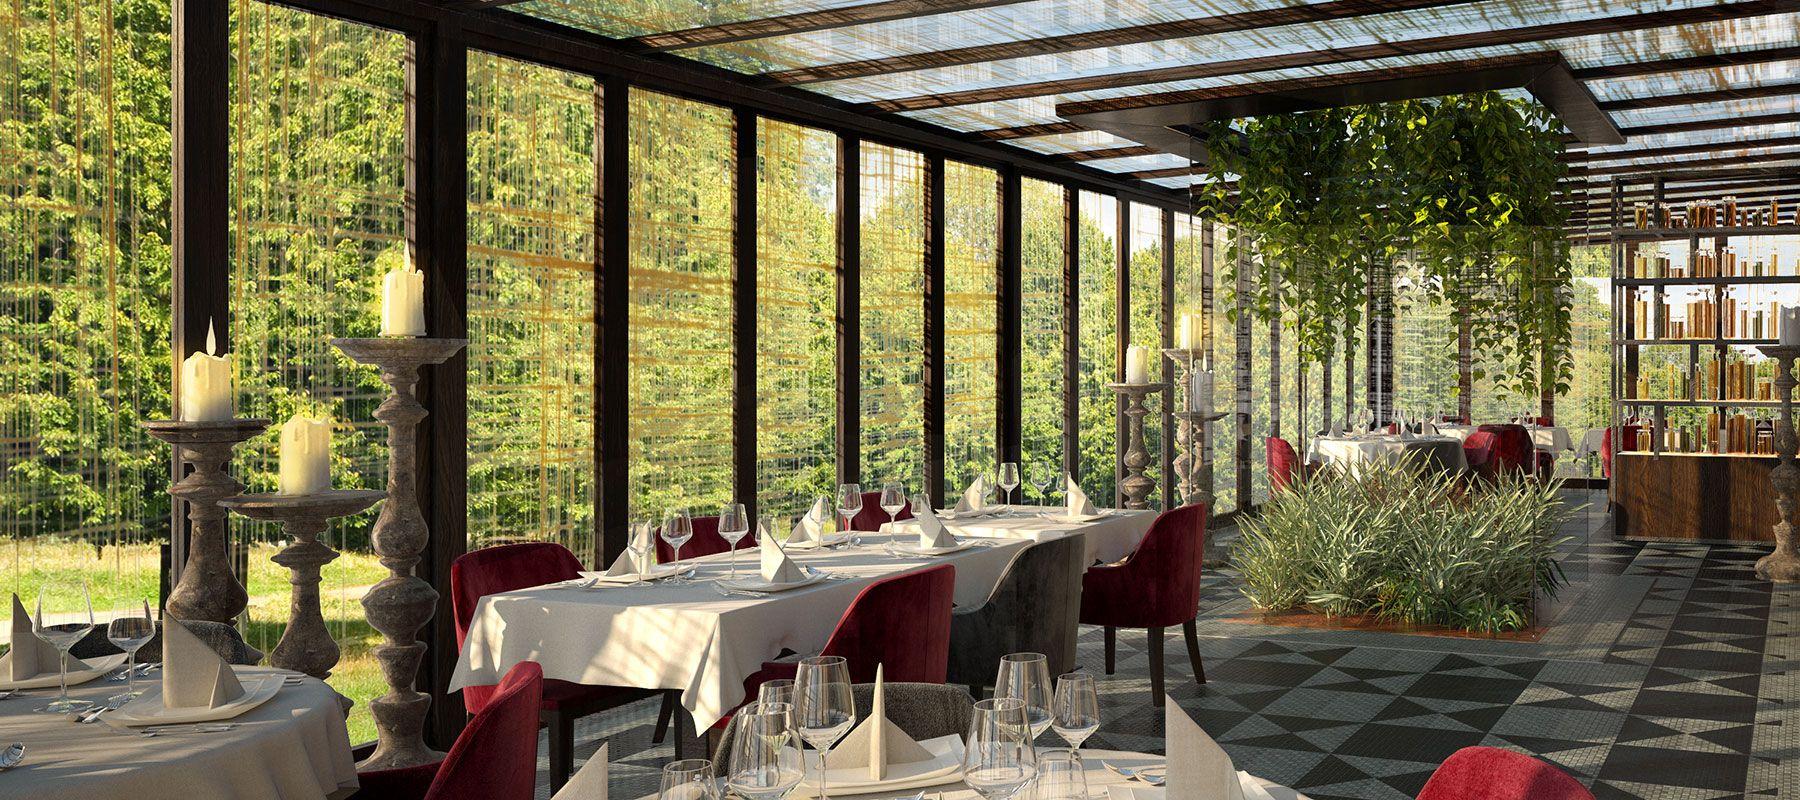 Johann Lafers Stromburg | Kitzig Interior Design | Hospitality ...